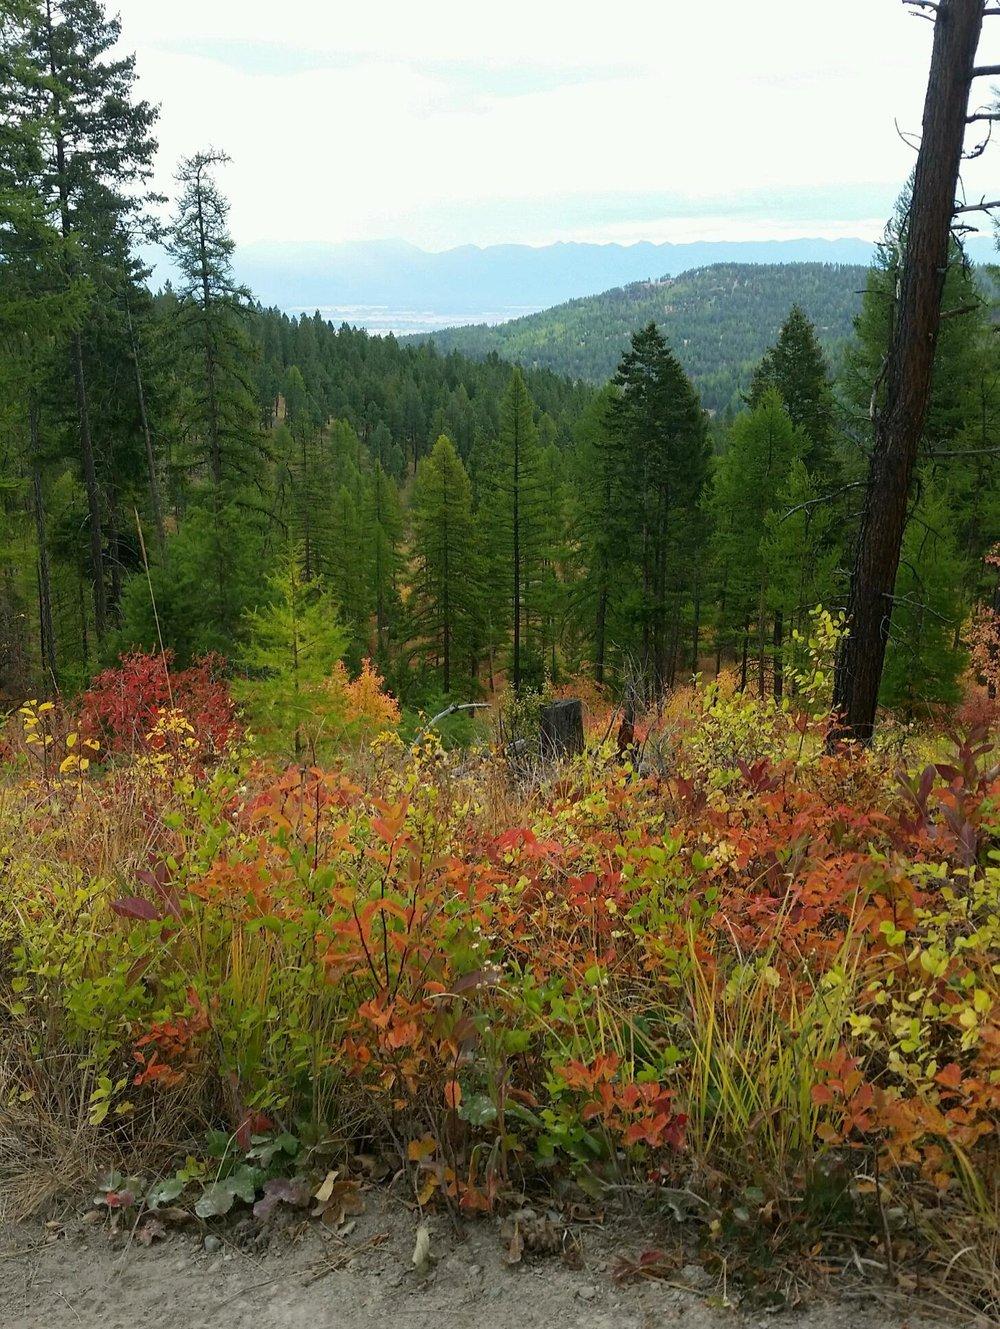 foys to blacktail trails trail marathon ftbtIMG_1773.JPG